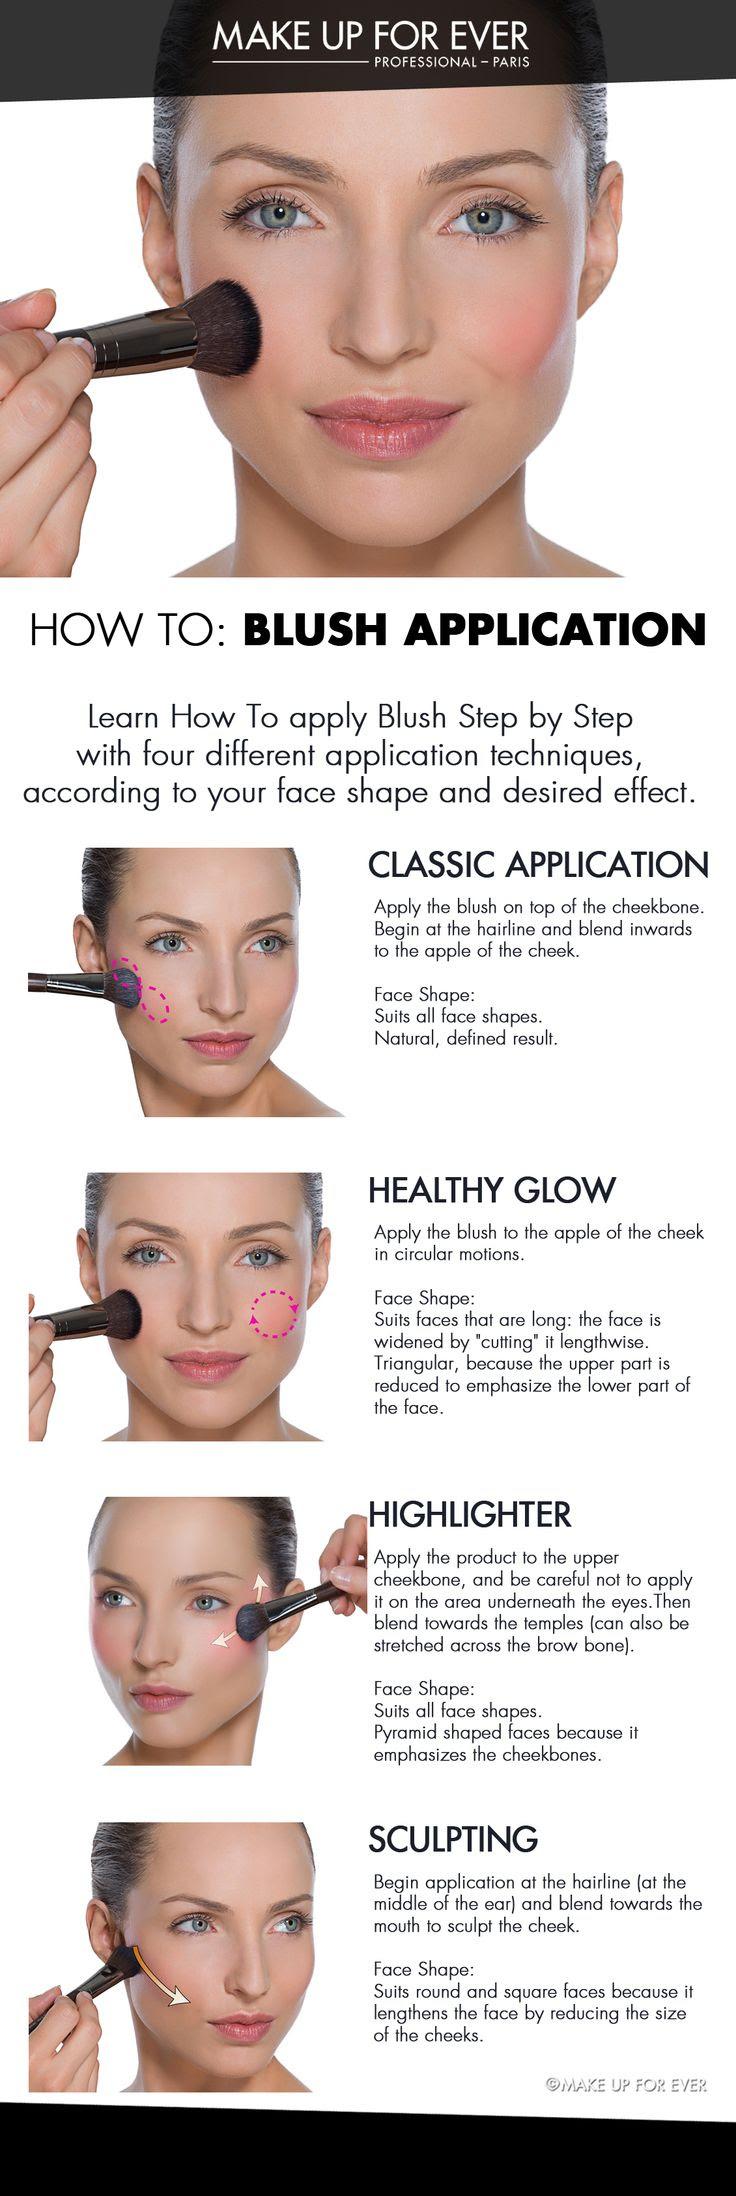 Eye makeup for older women 3 years